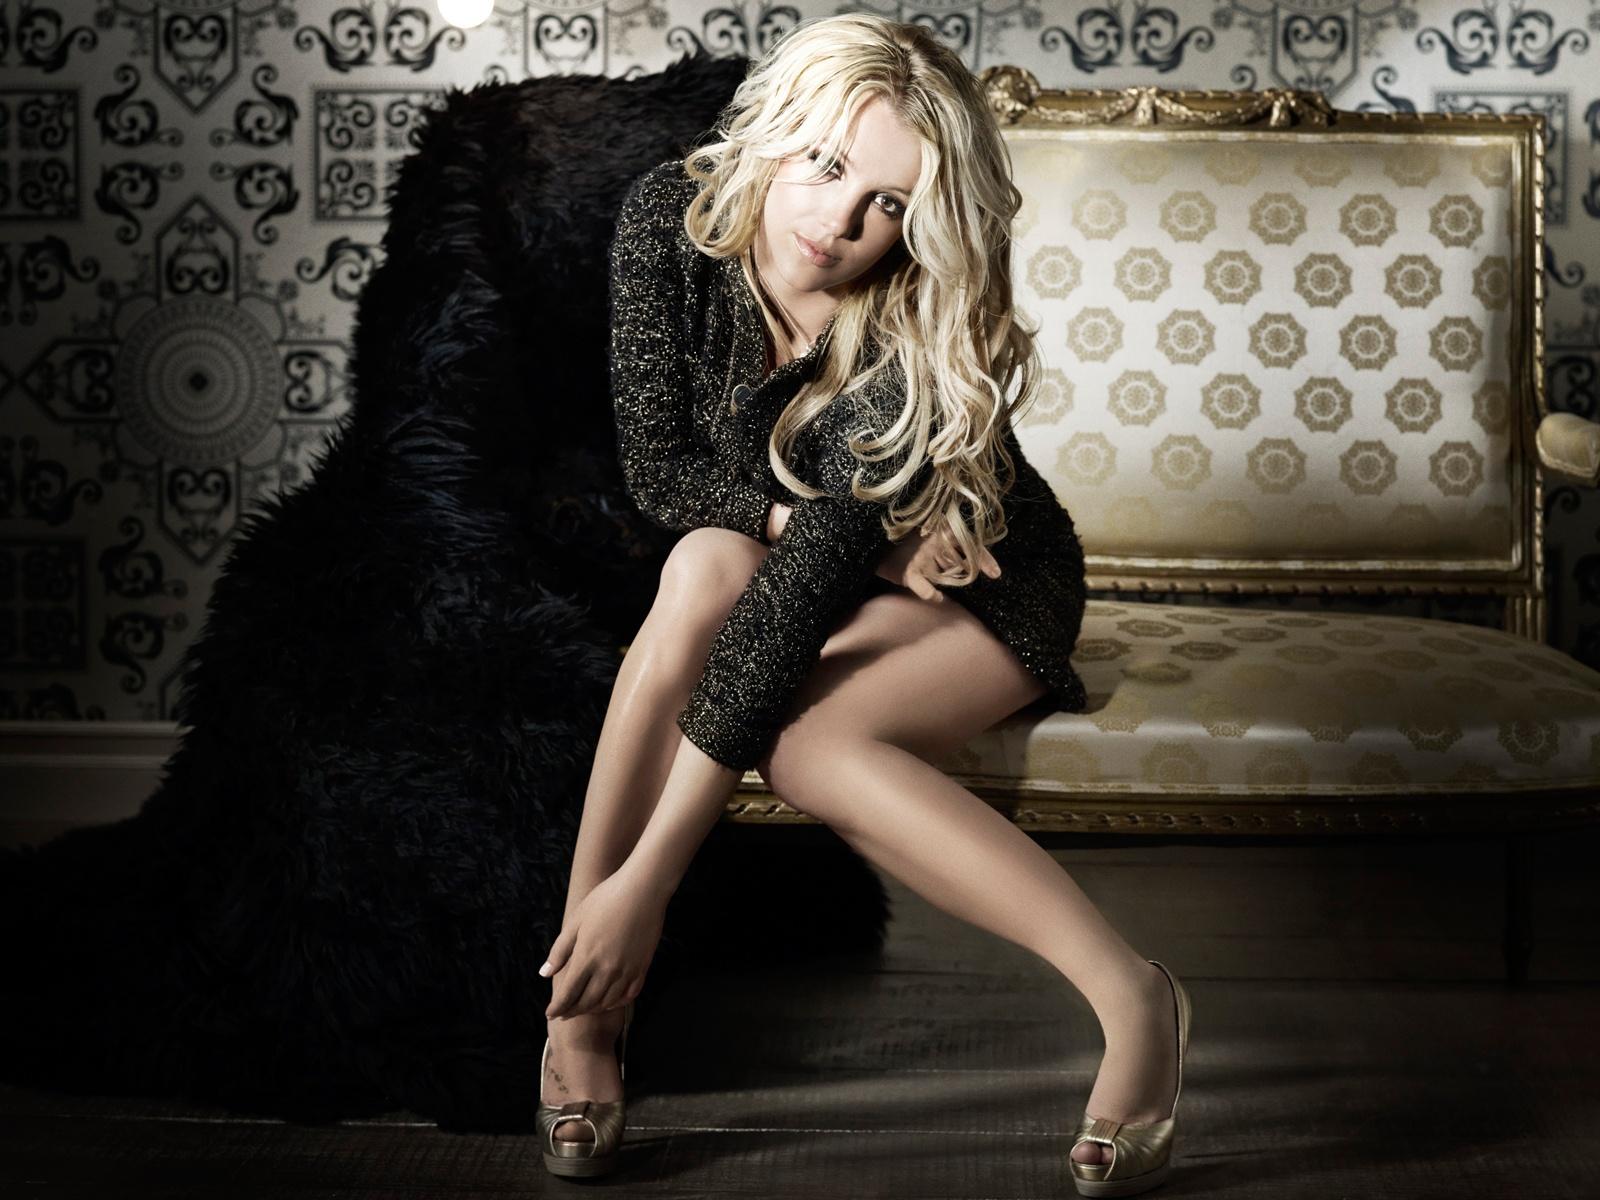 http://2.bp.blogspot.com/-U-SZ6HS1JHE/Tg0lOItQcOI/AAAAAAAAAVs/8ohE9CvgvoE/s1600/Britney-Spears-2011-Wallpaper-HD-Wallpapers-for-fullscreen-and-widescreen-desktop-background-britney_spears_2011-1600x1200.jpg